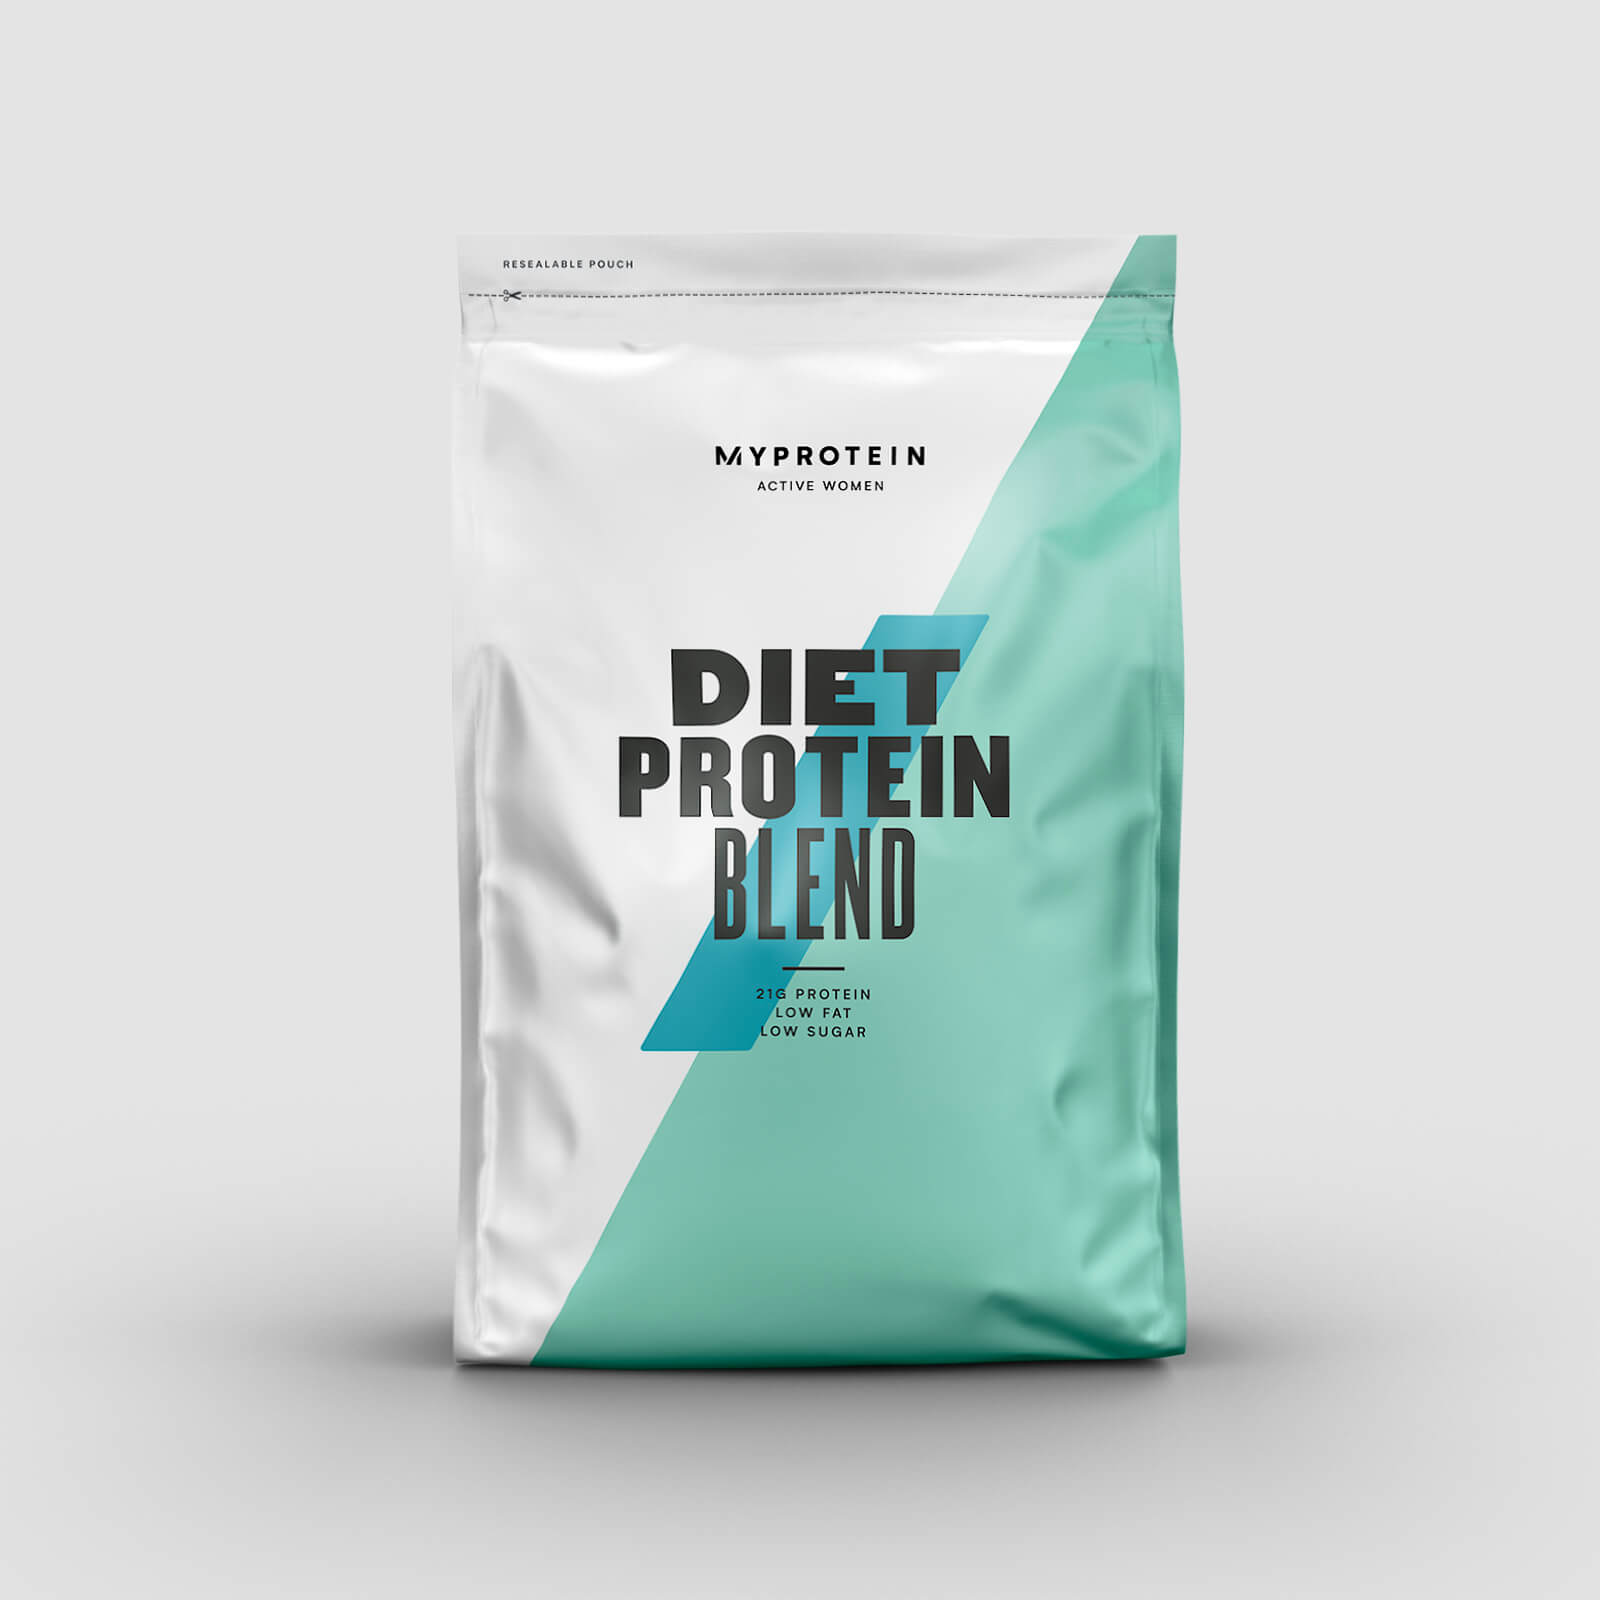 Dieta proteica romania